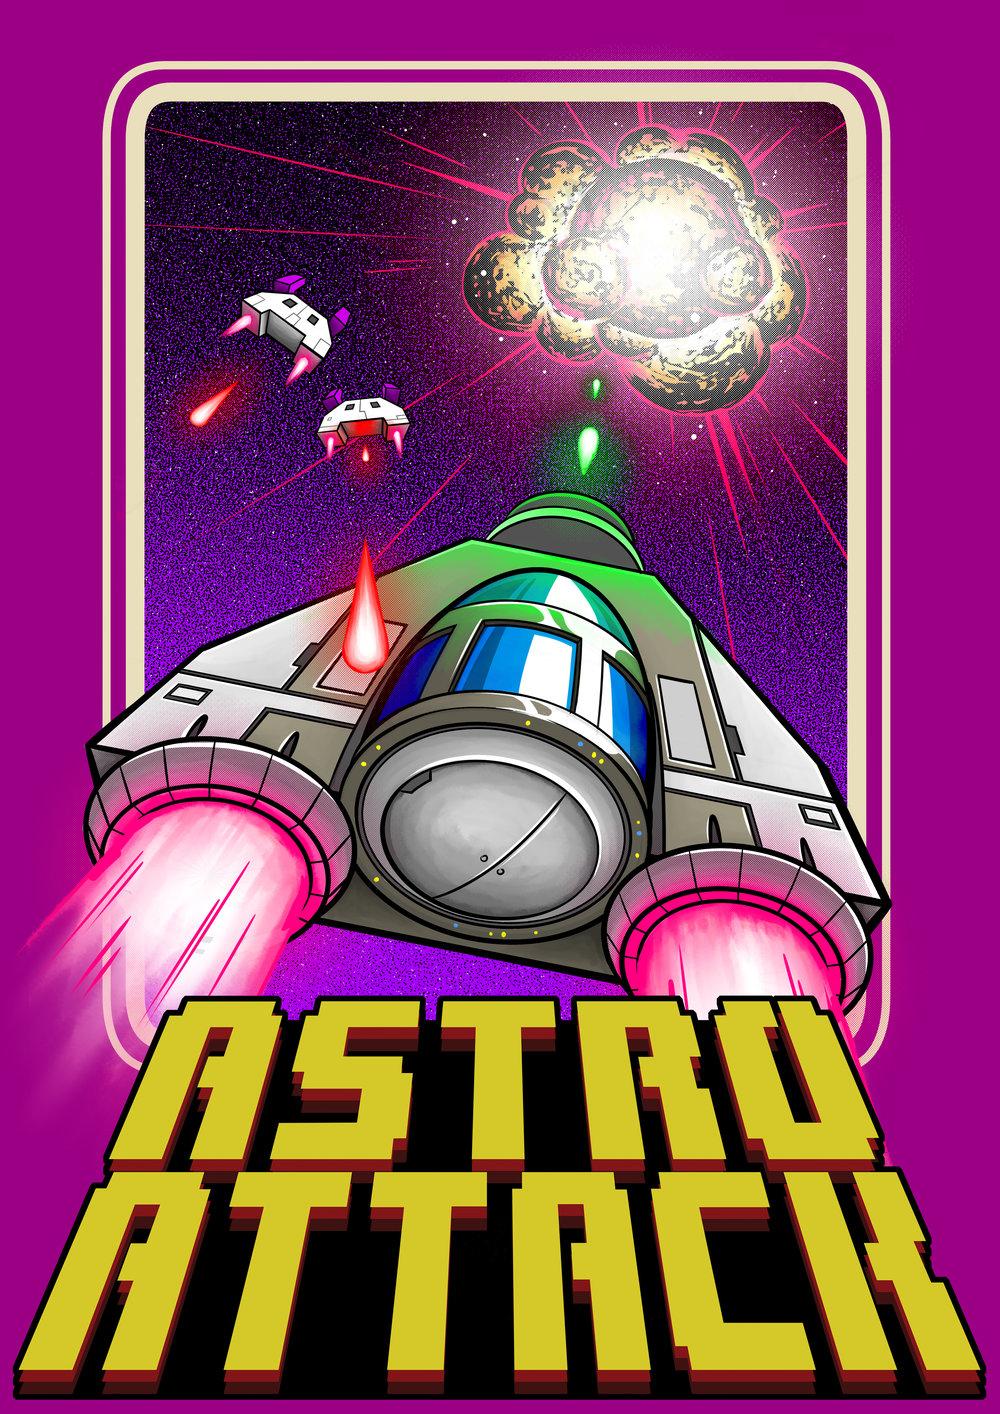 astro-03.jpg